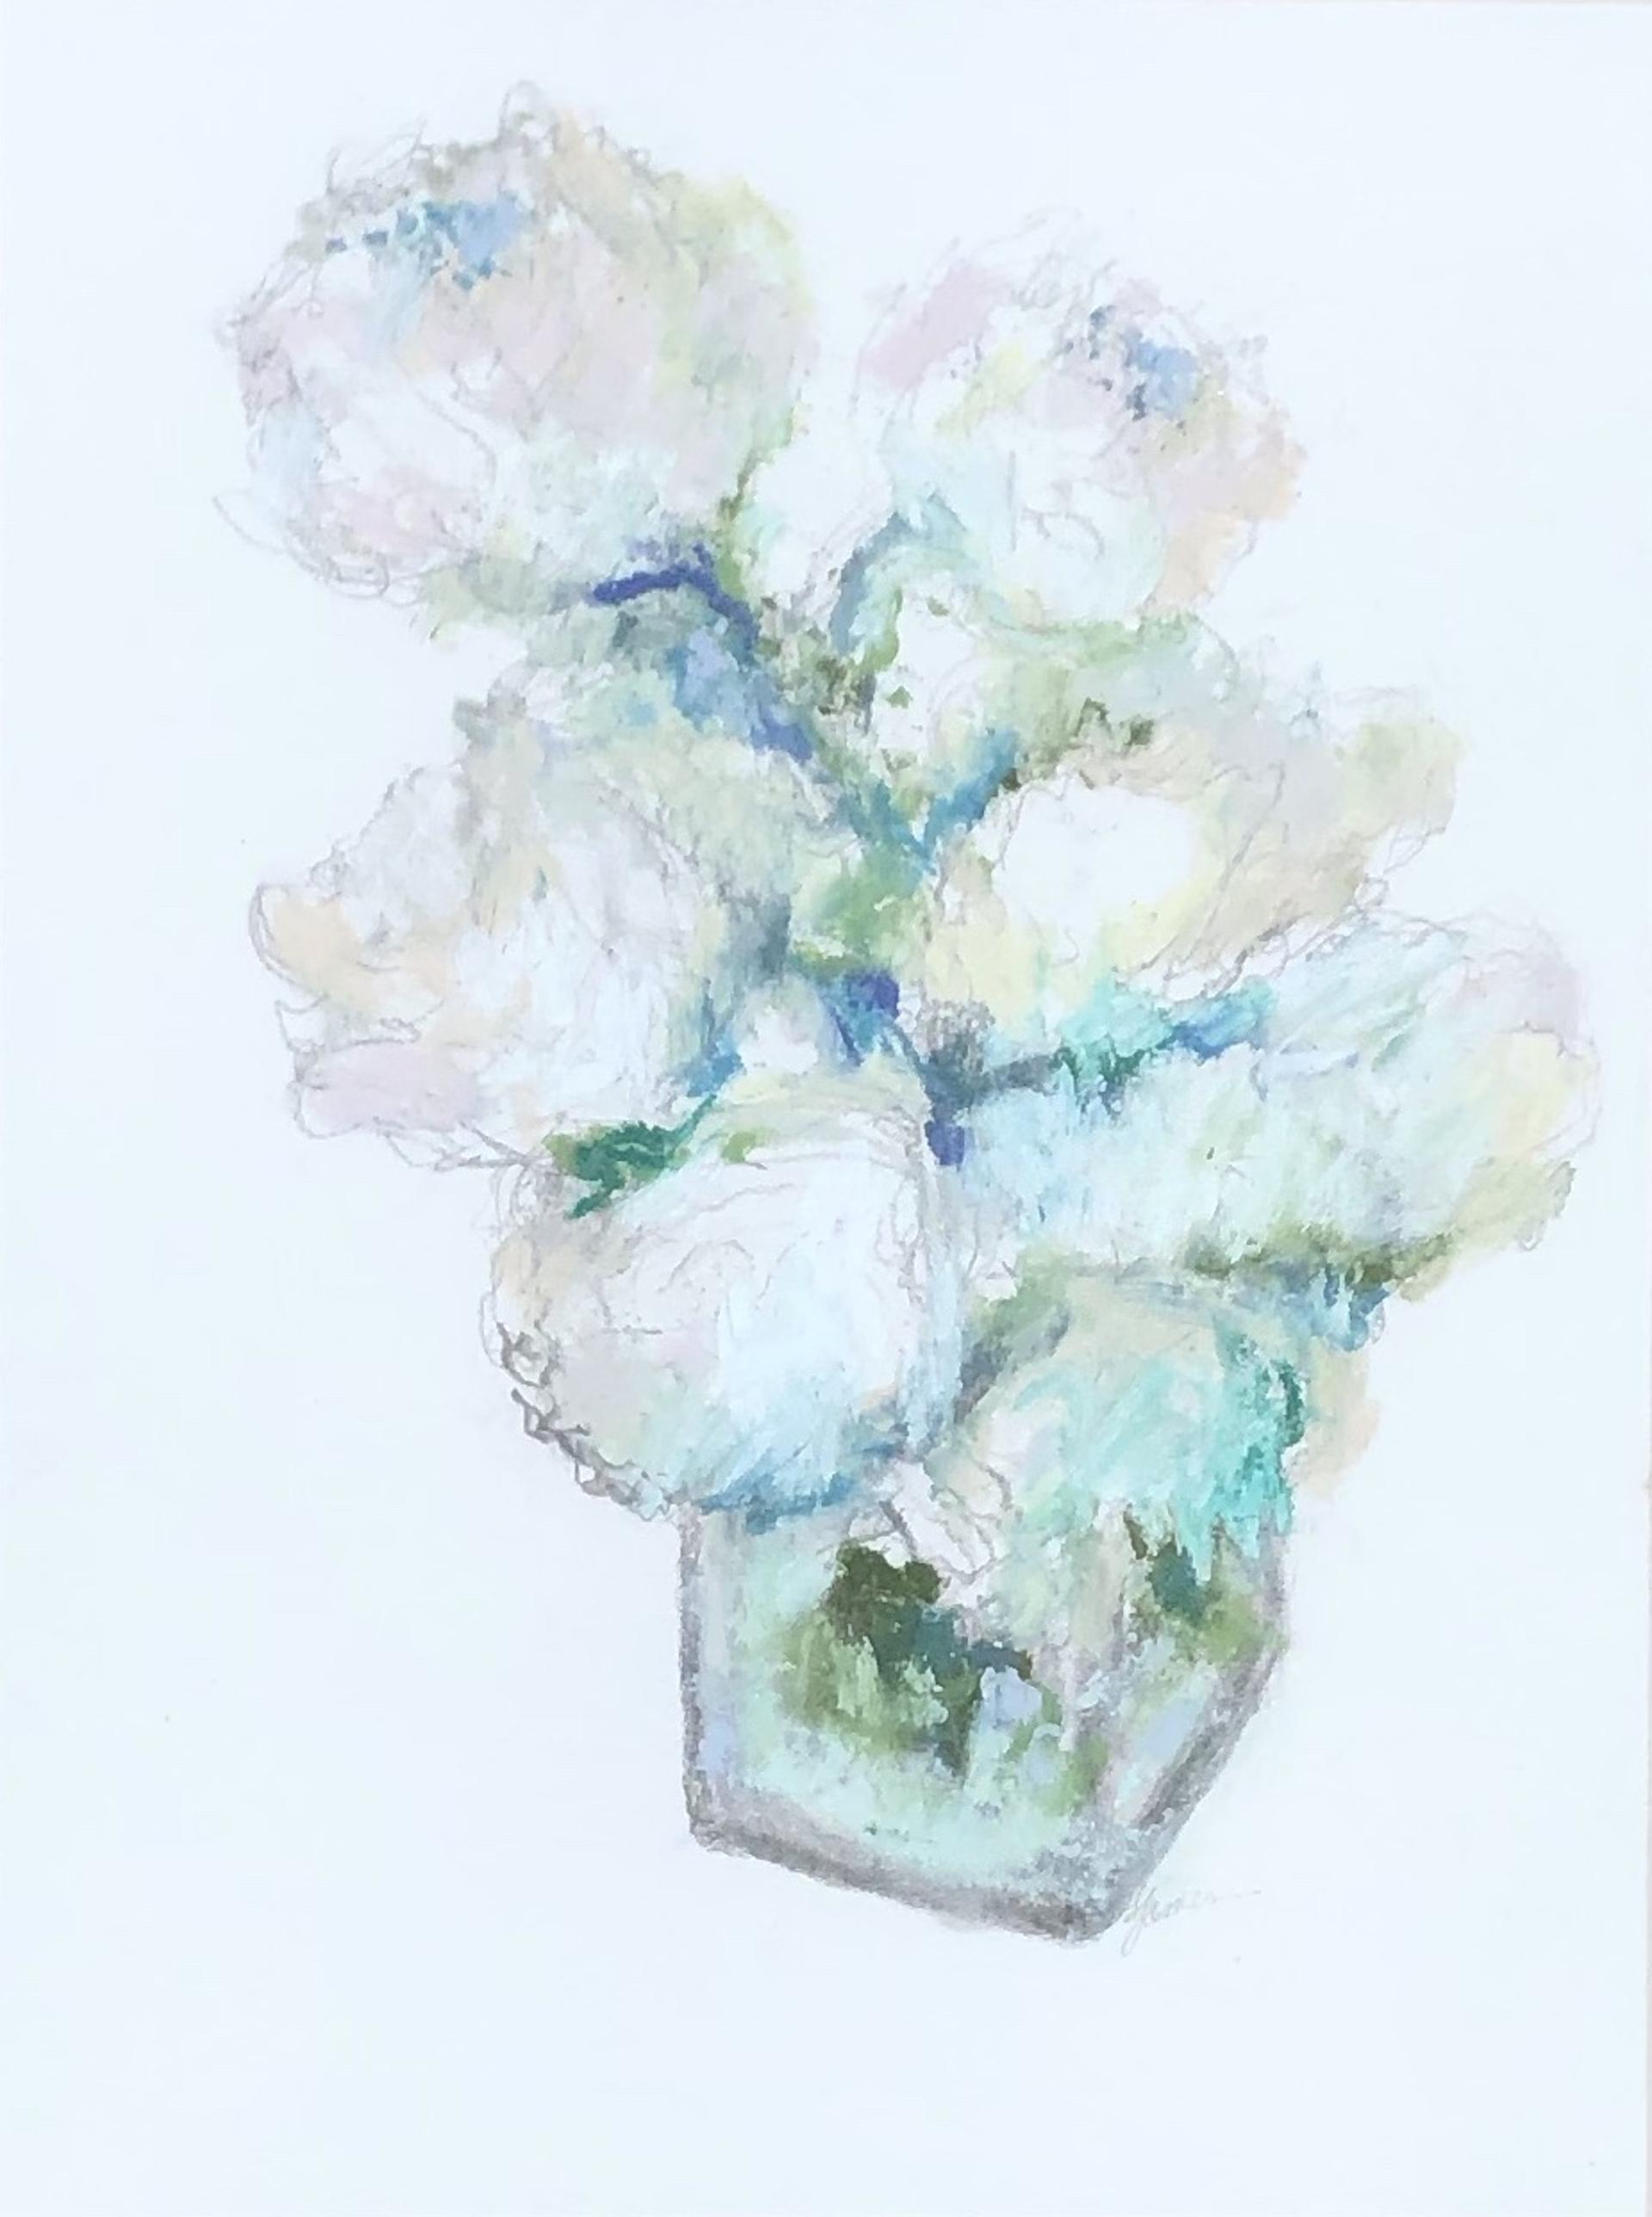 Gaze Upon Beauty by Linda James